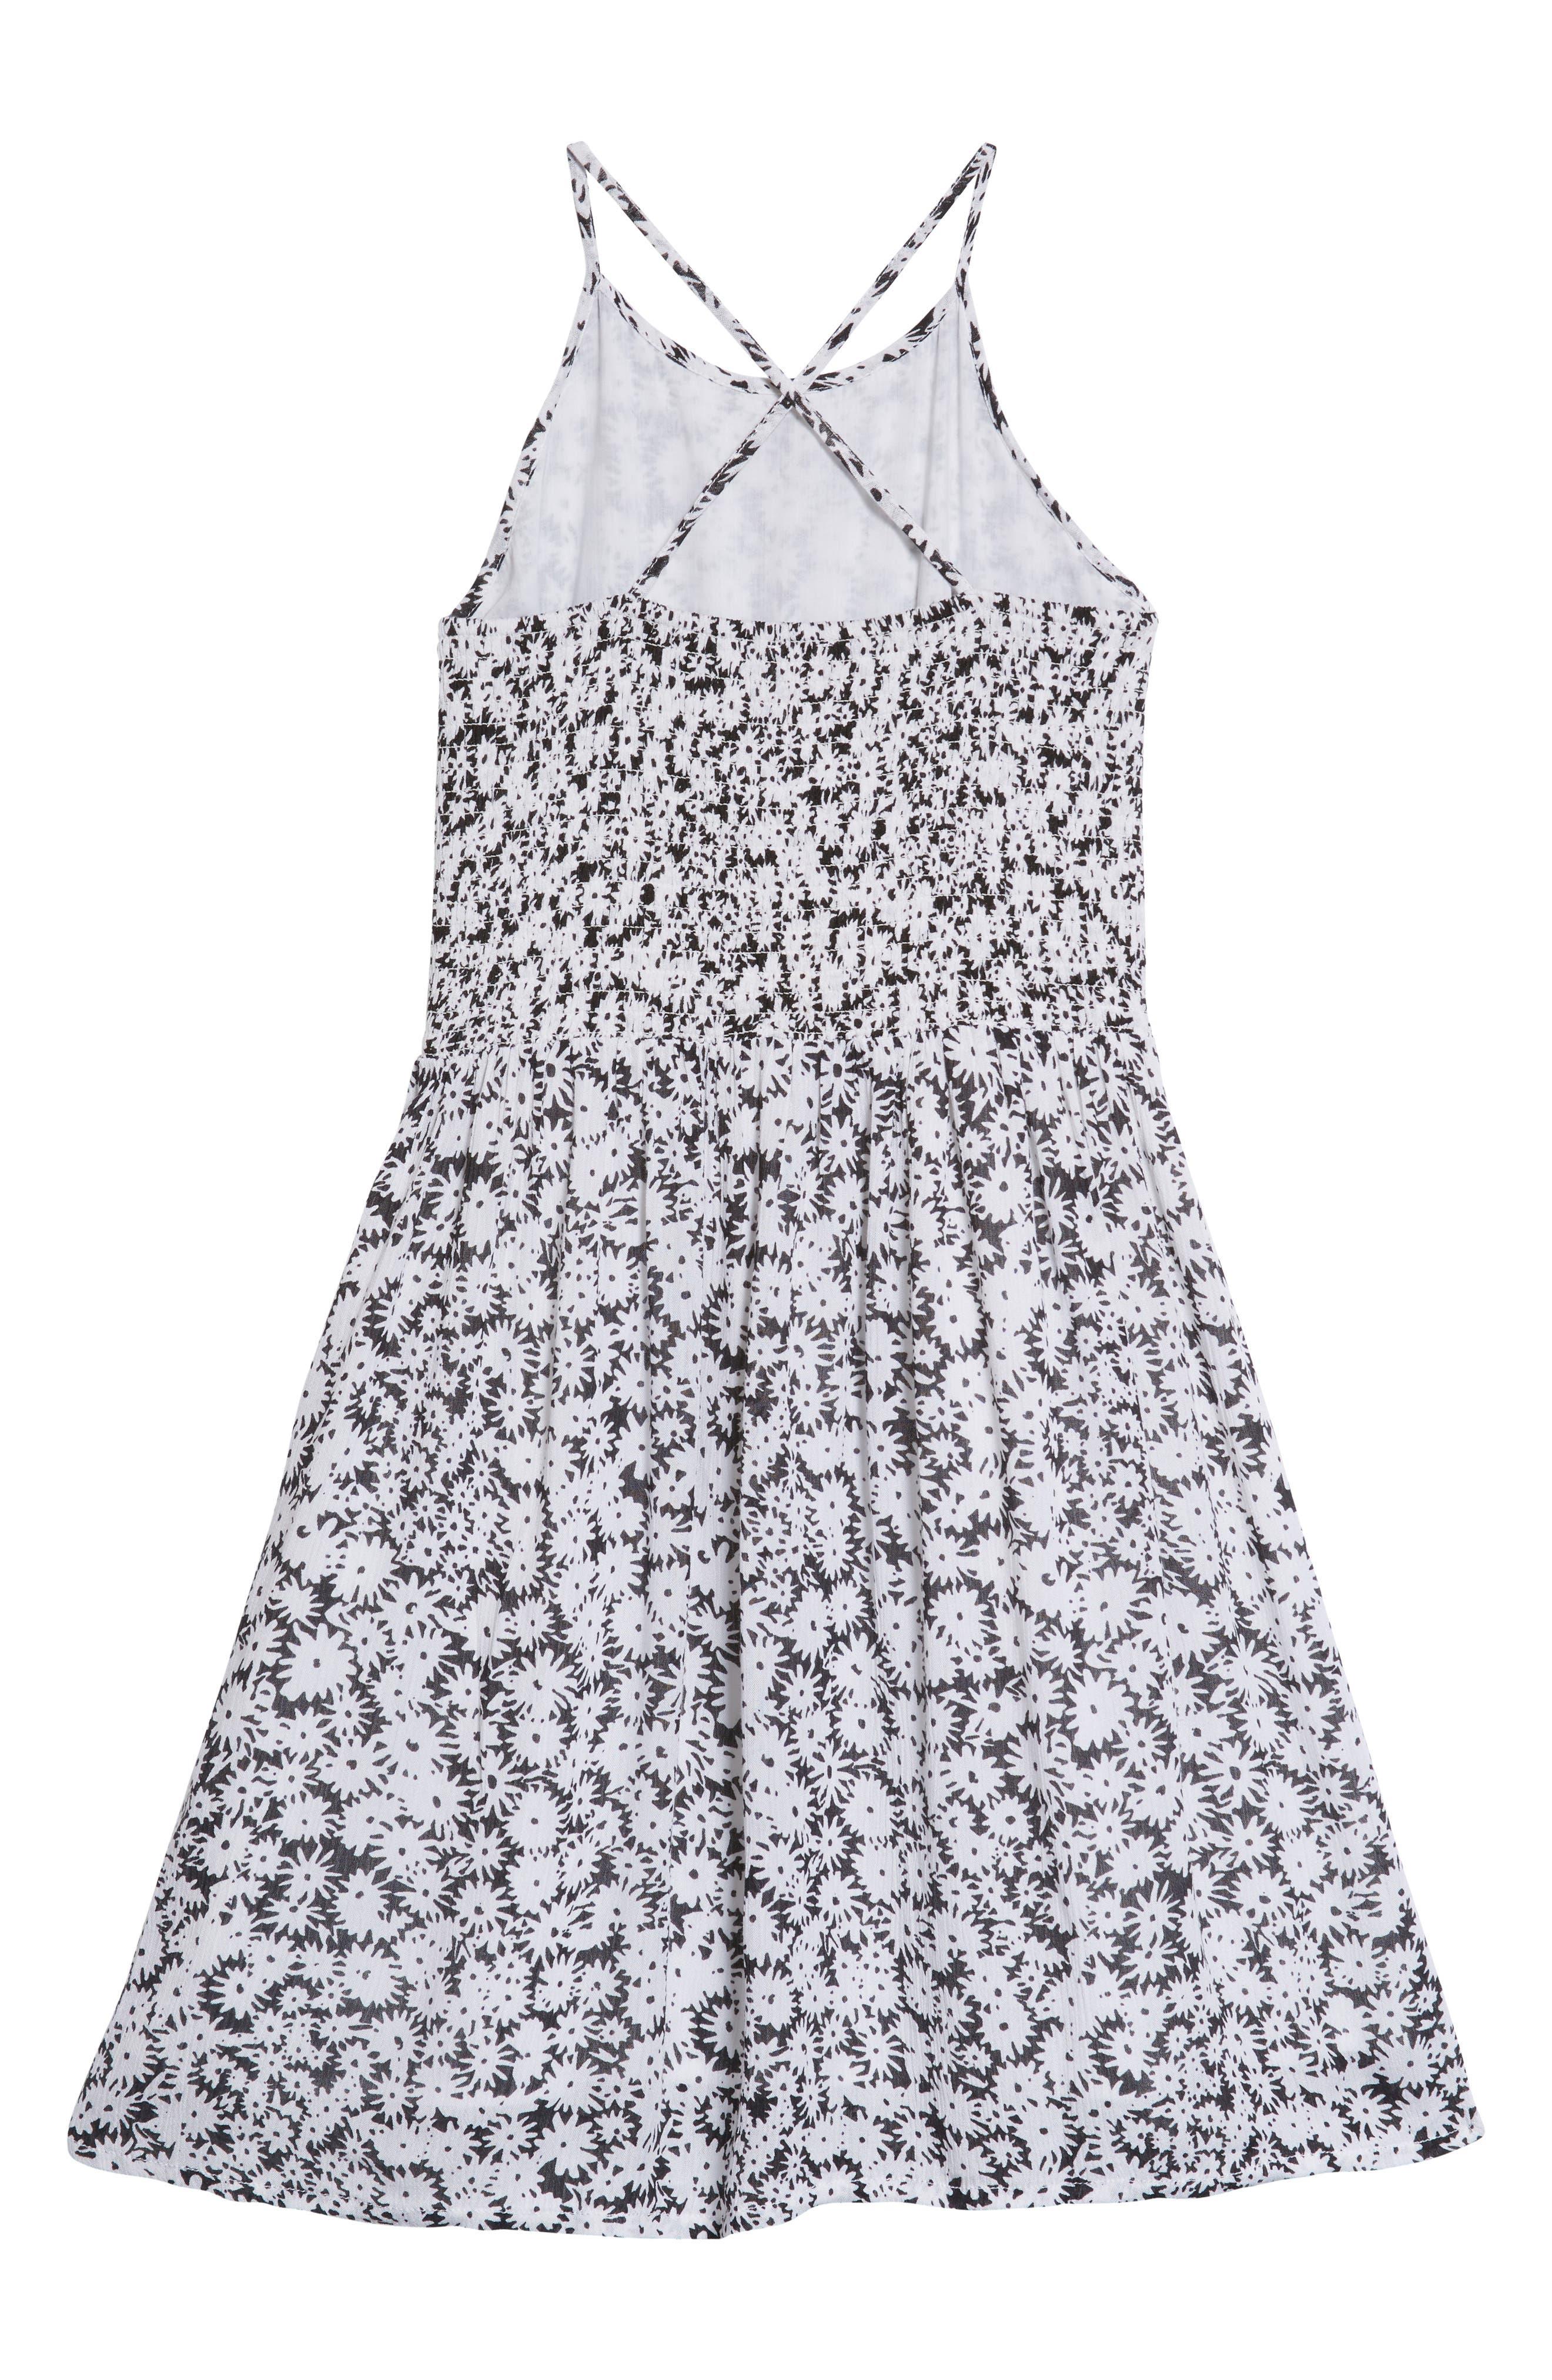 TUCKER + TATE,                             Smocked Dress,                             Alternate thumbnail 2, color,                             001